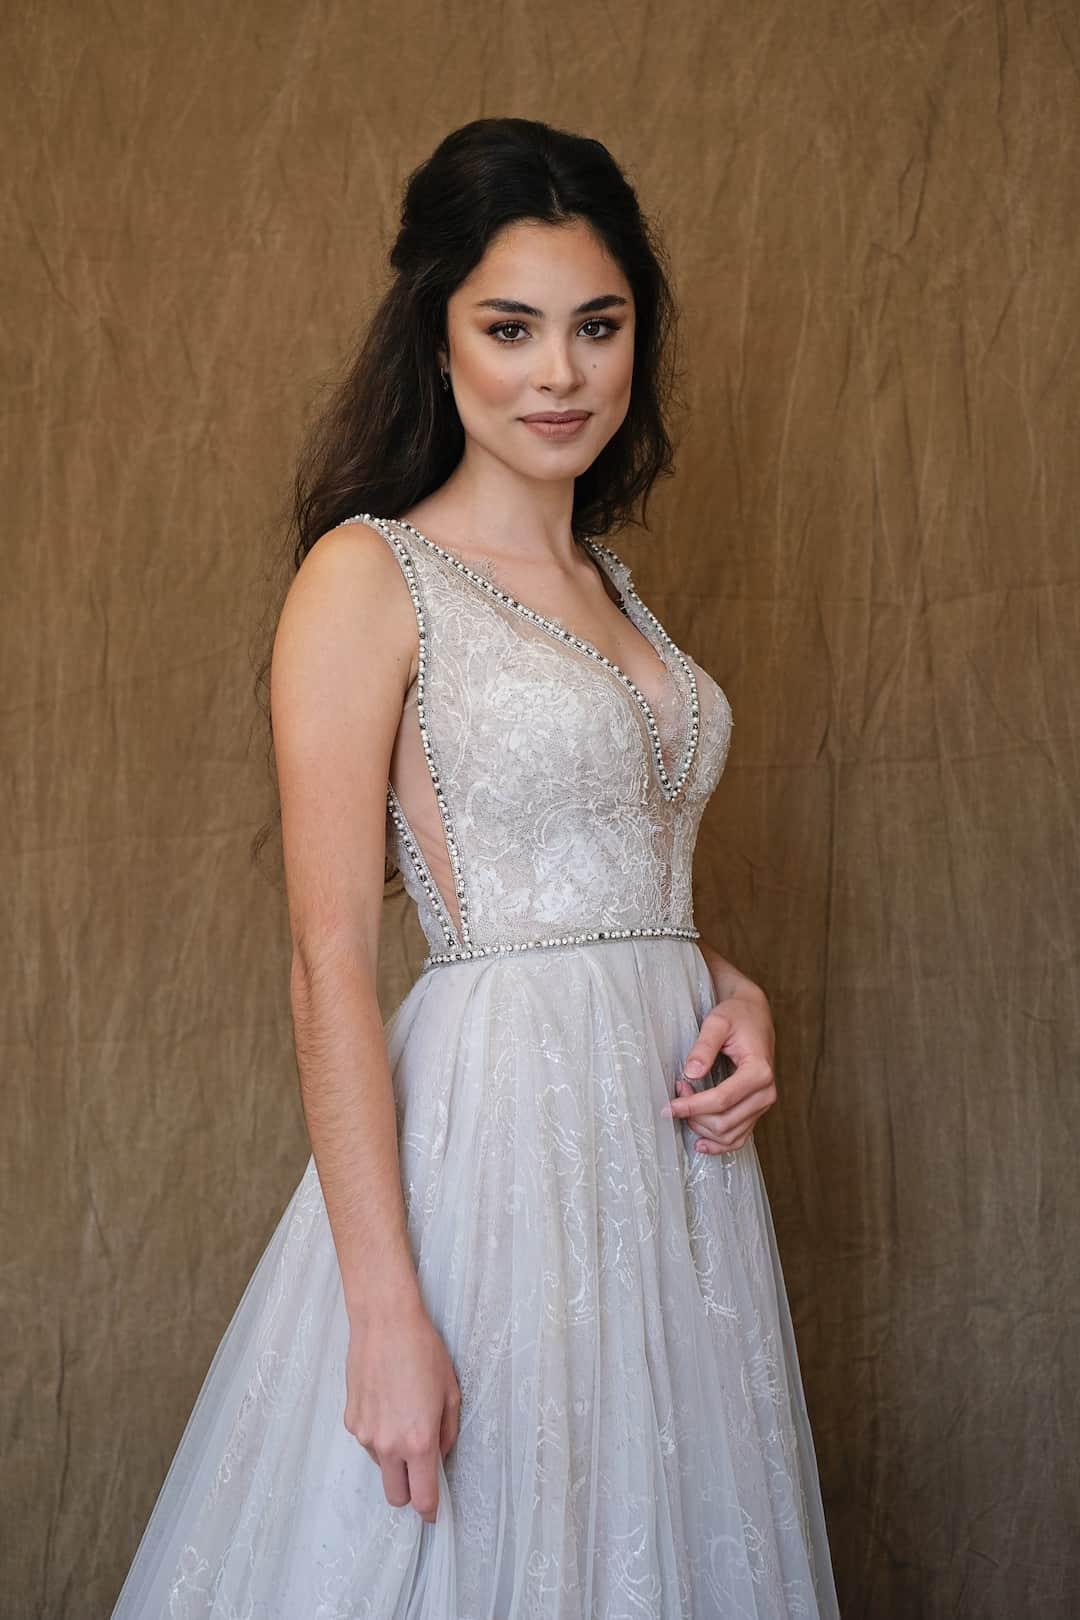 Haute Couture esküvöi ruhák - Galia Lahav - Gala 711 - front_top